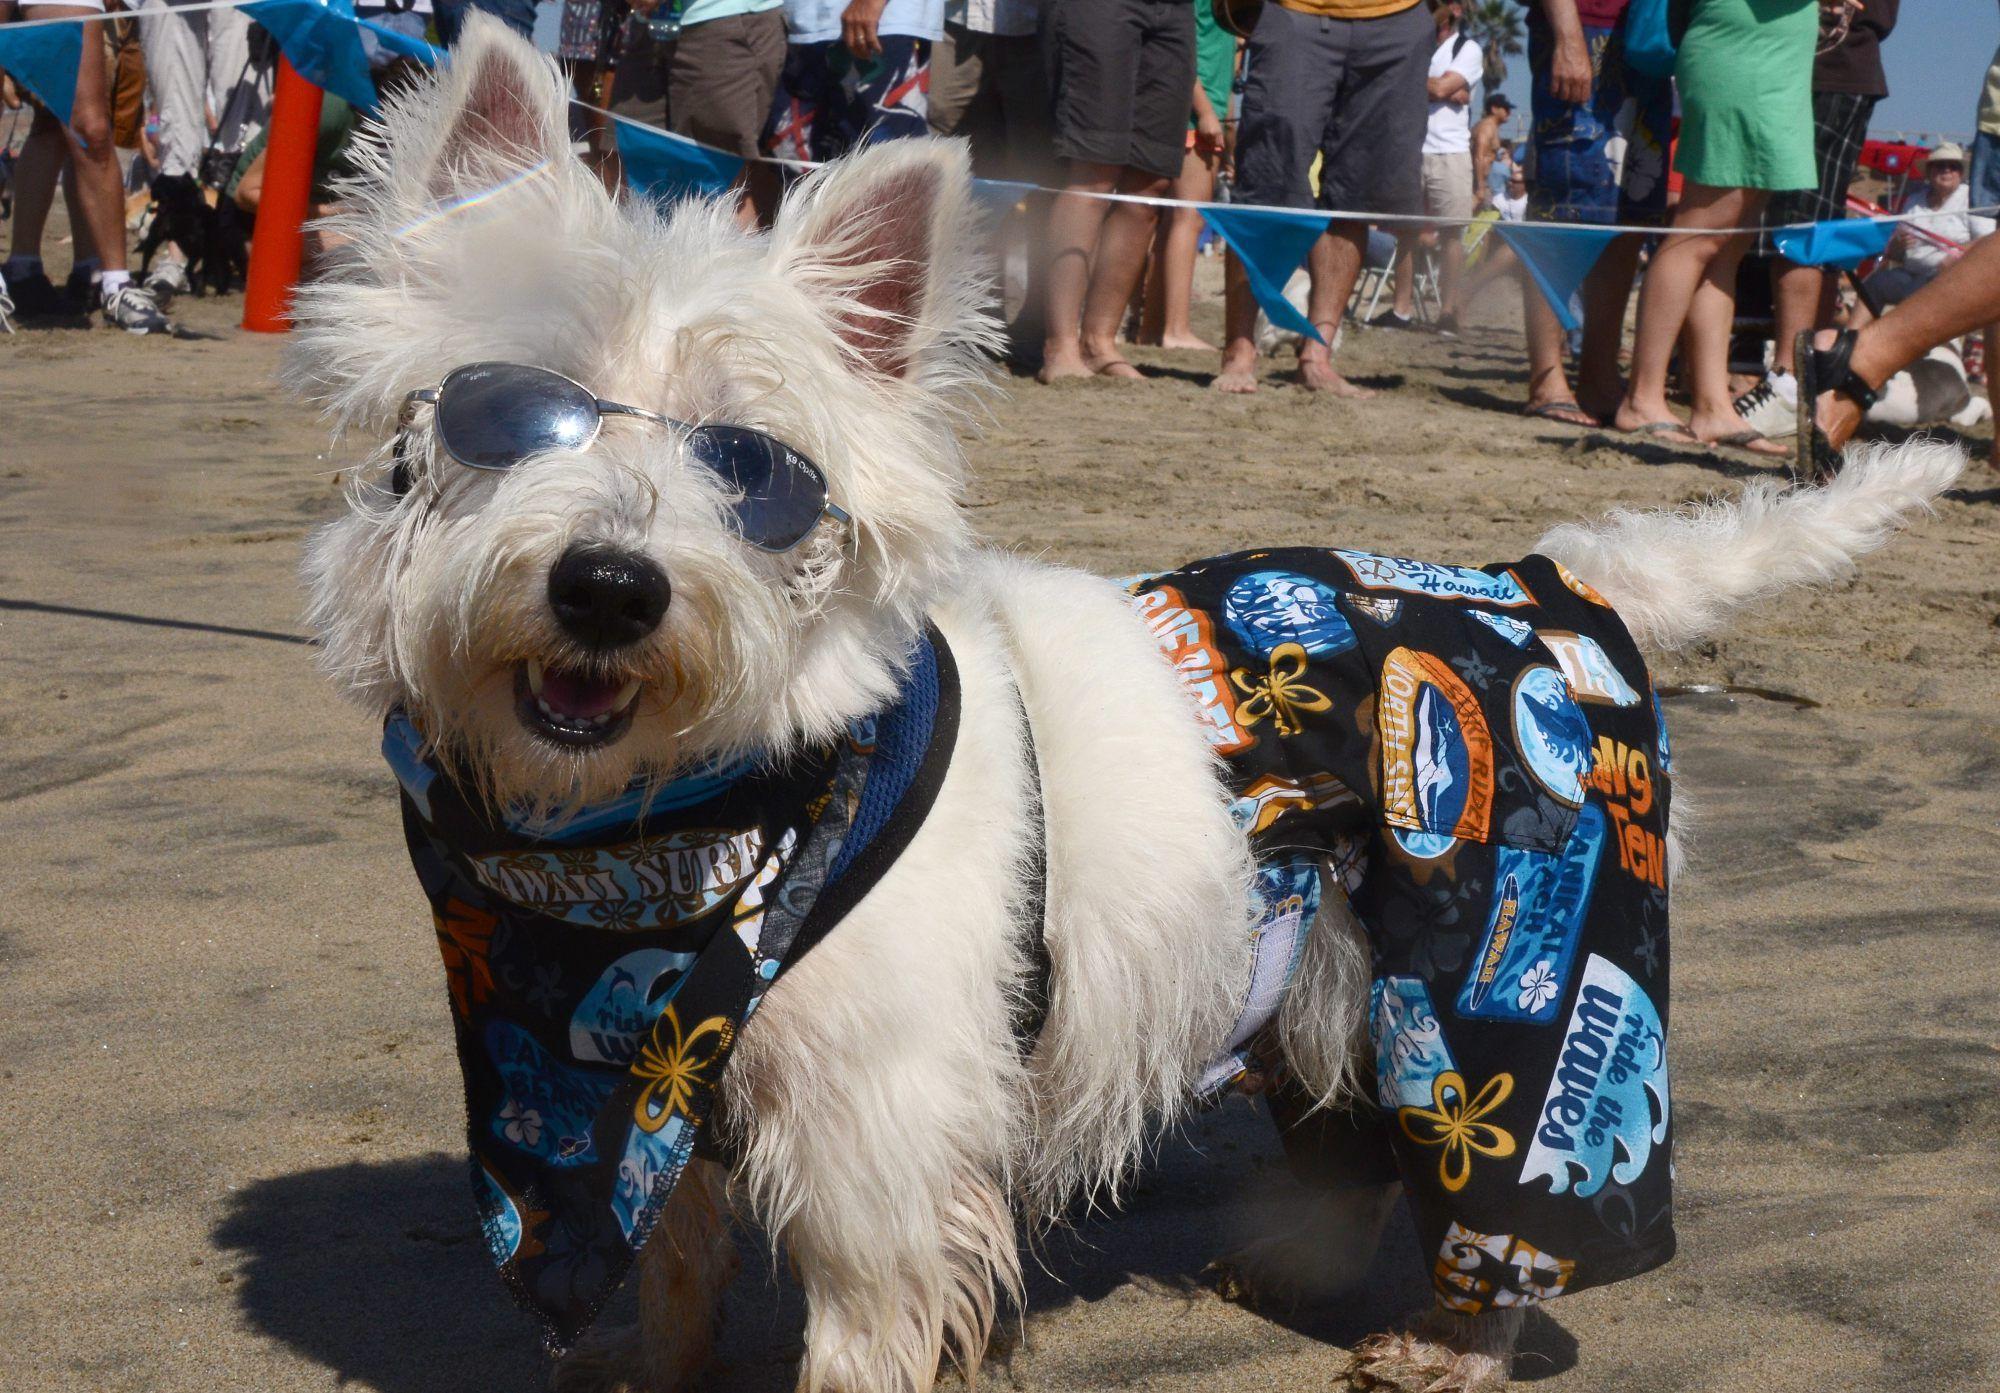 15195e7c8eb Best Dog-Walking Trails In Orange County - CBS Los Angeles